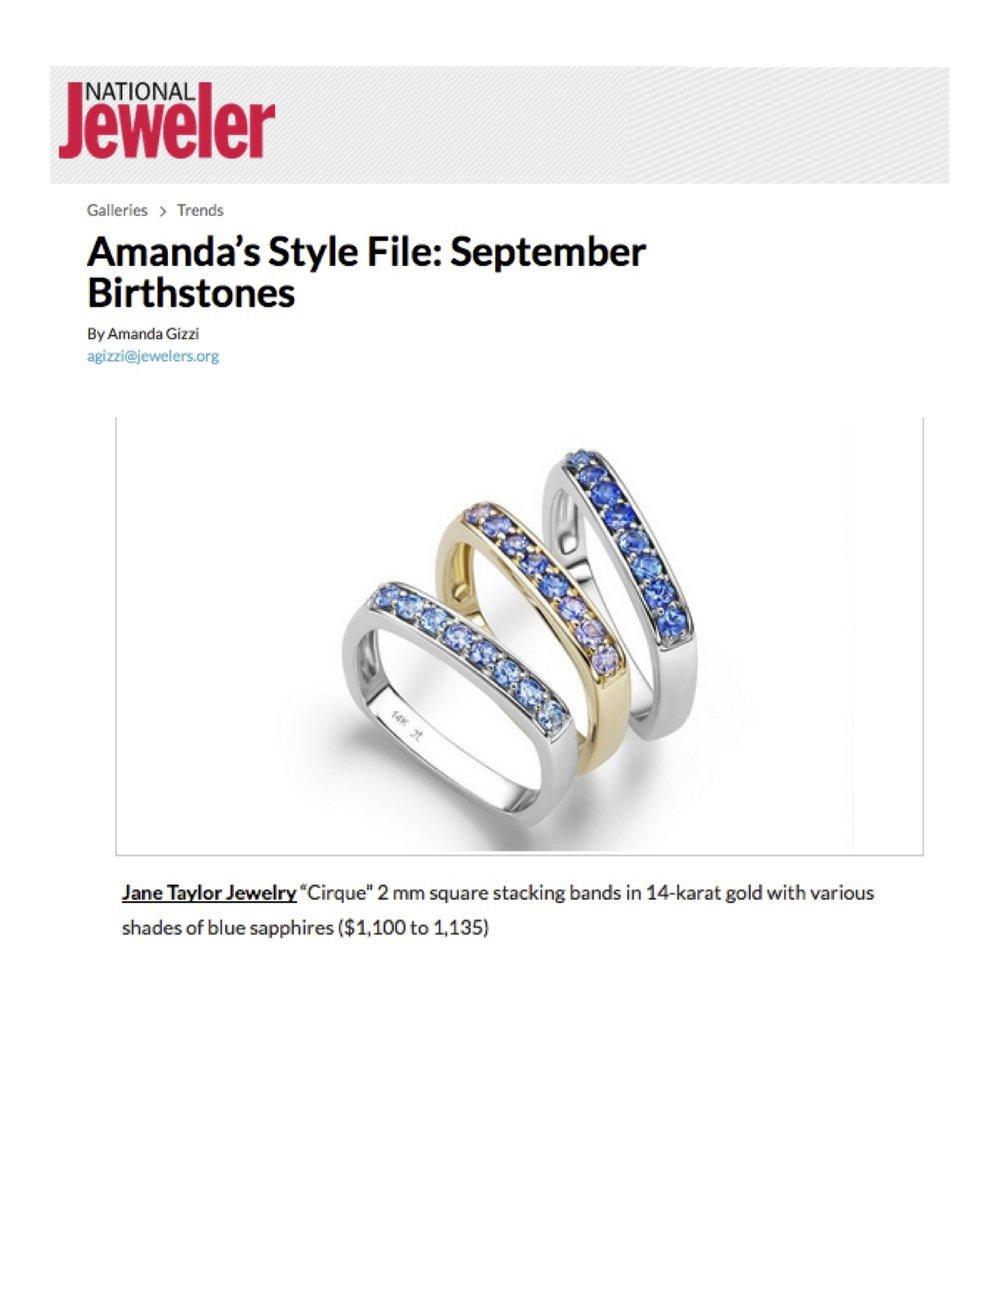 2017-9.5-National Jeweler.com.jpg